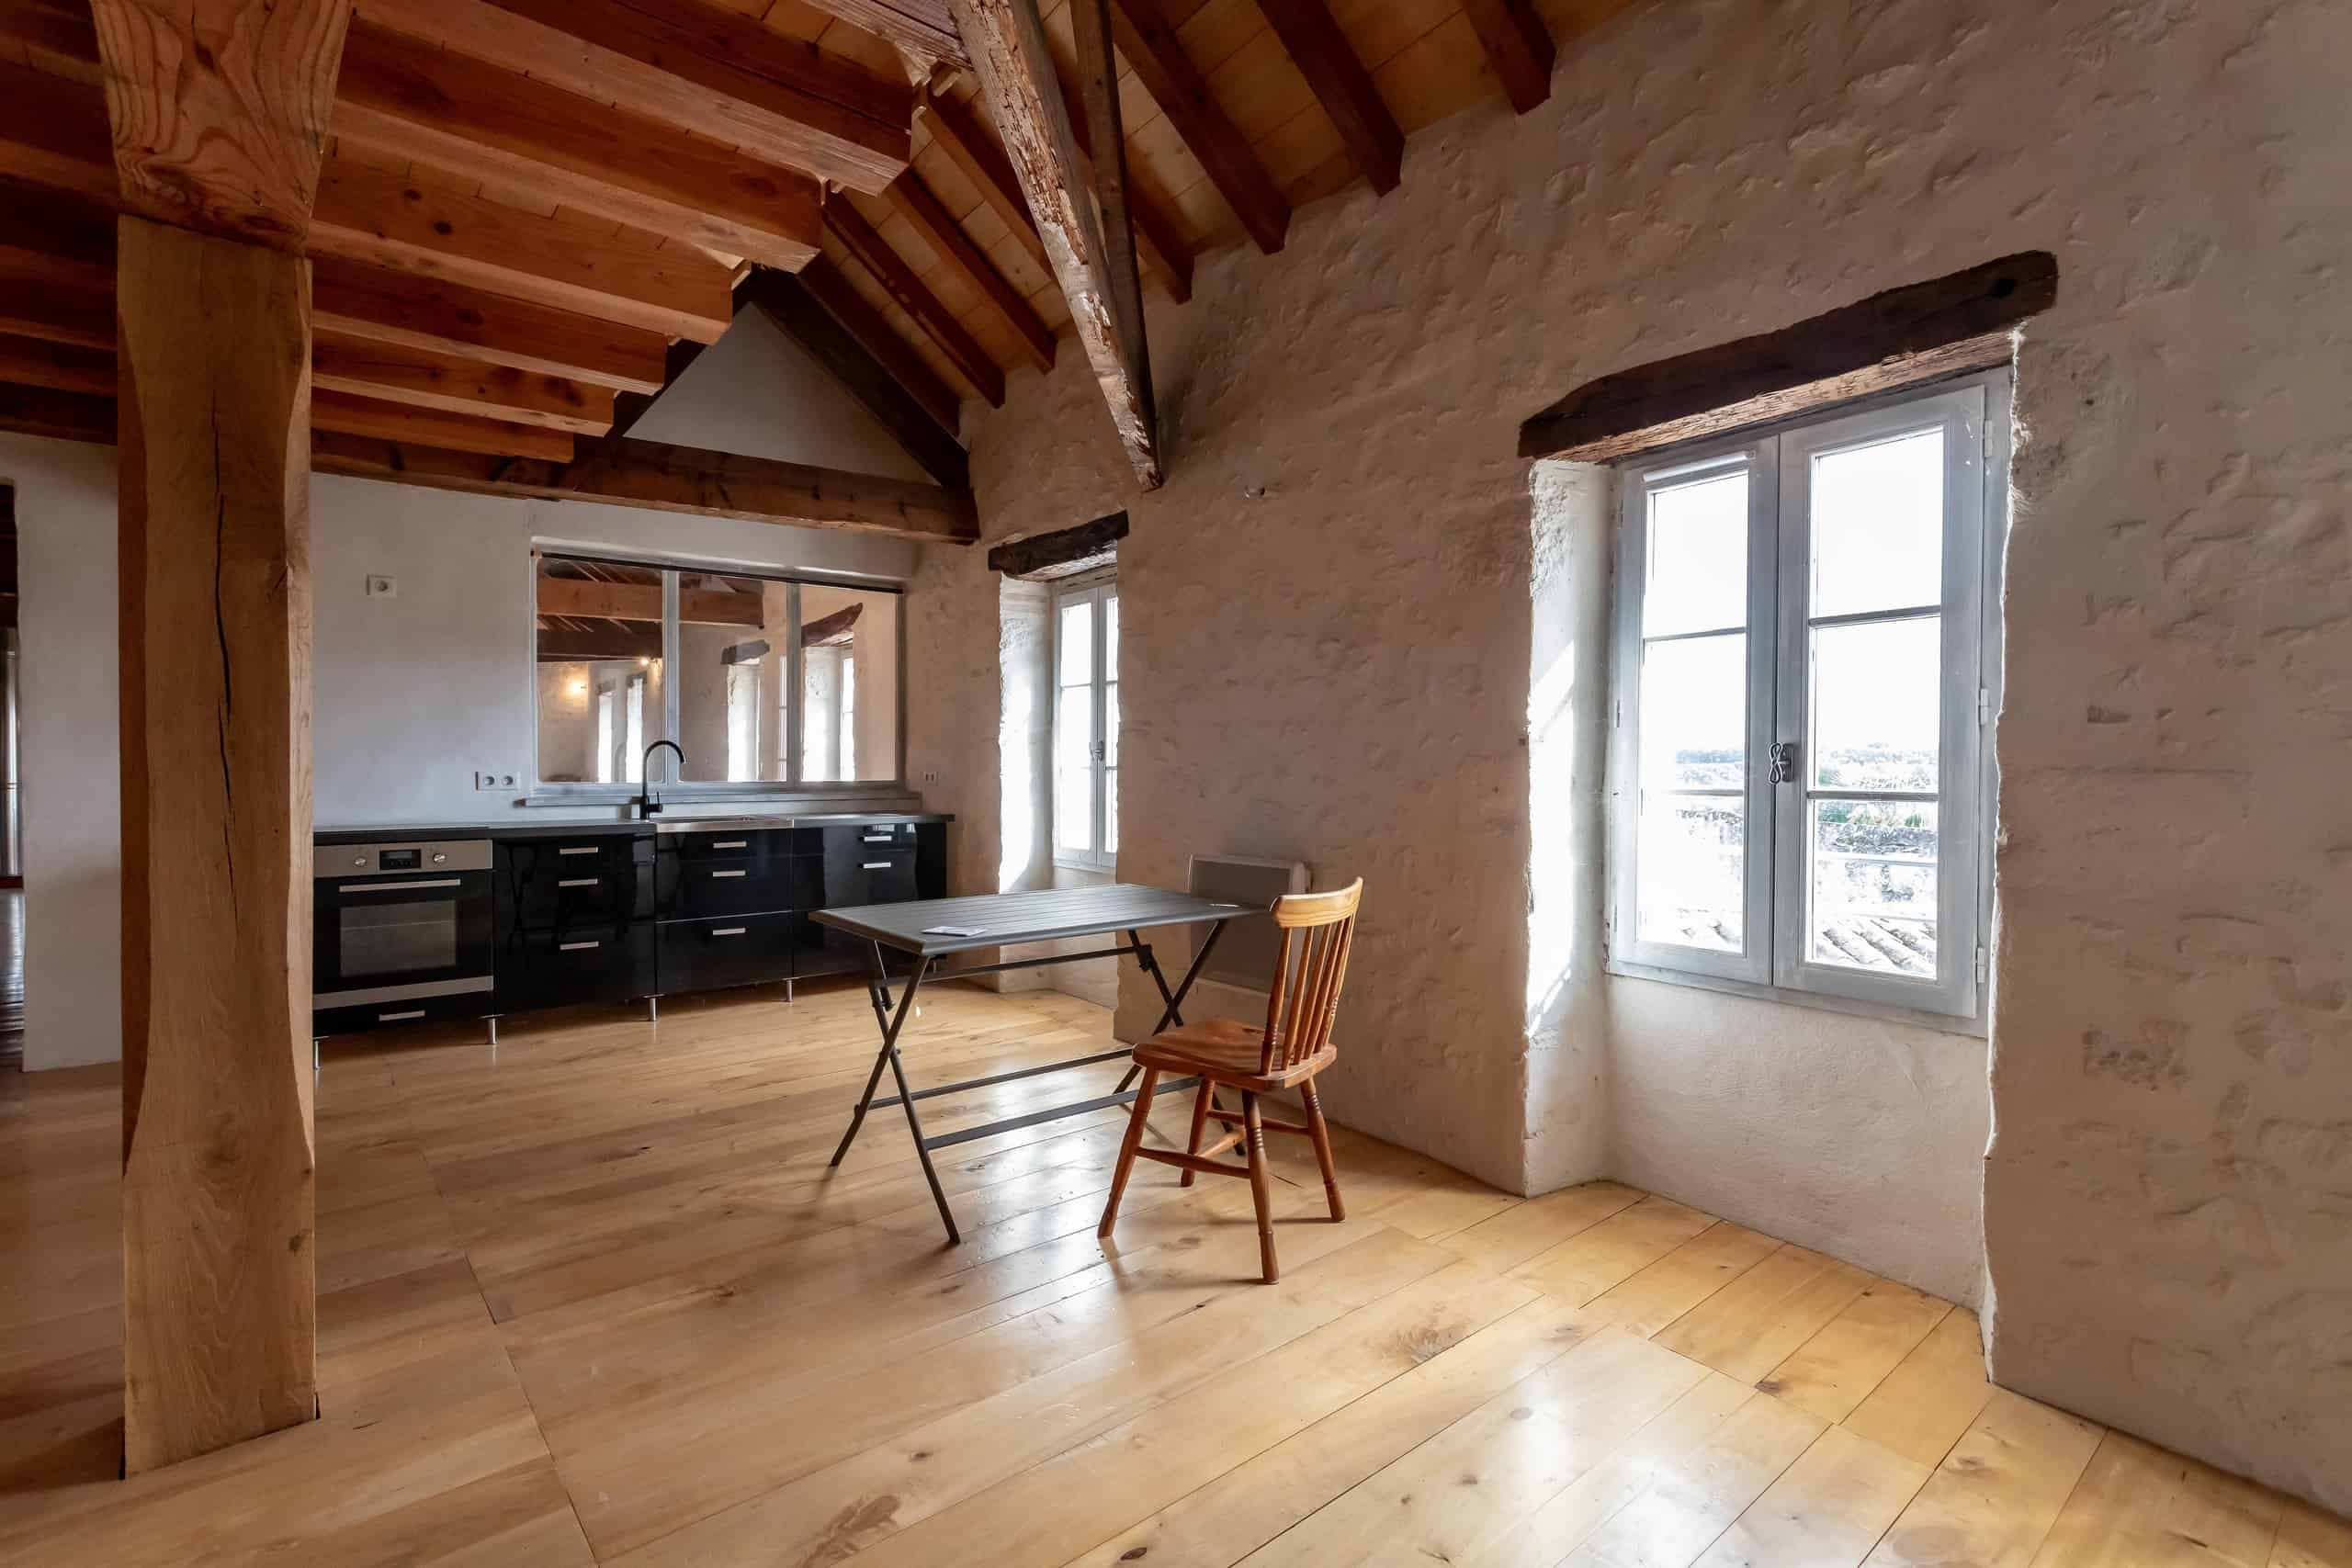 Apartment-2-WMC111